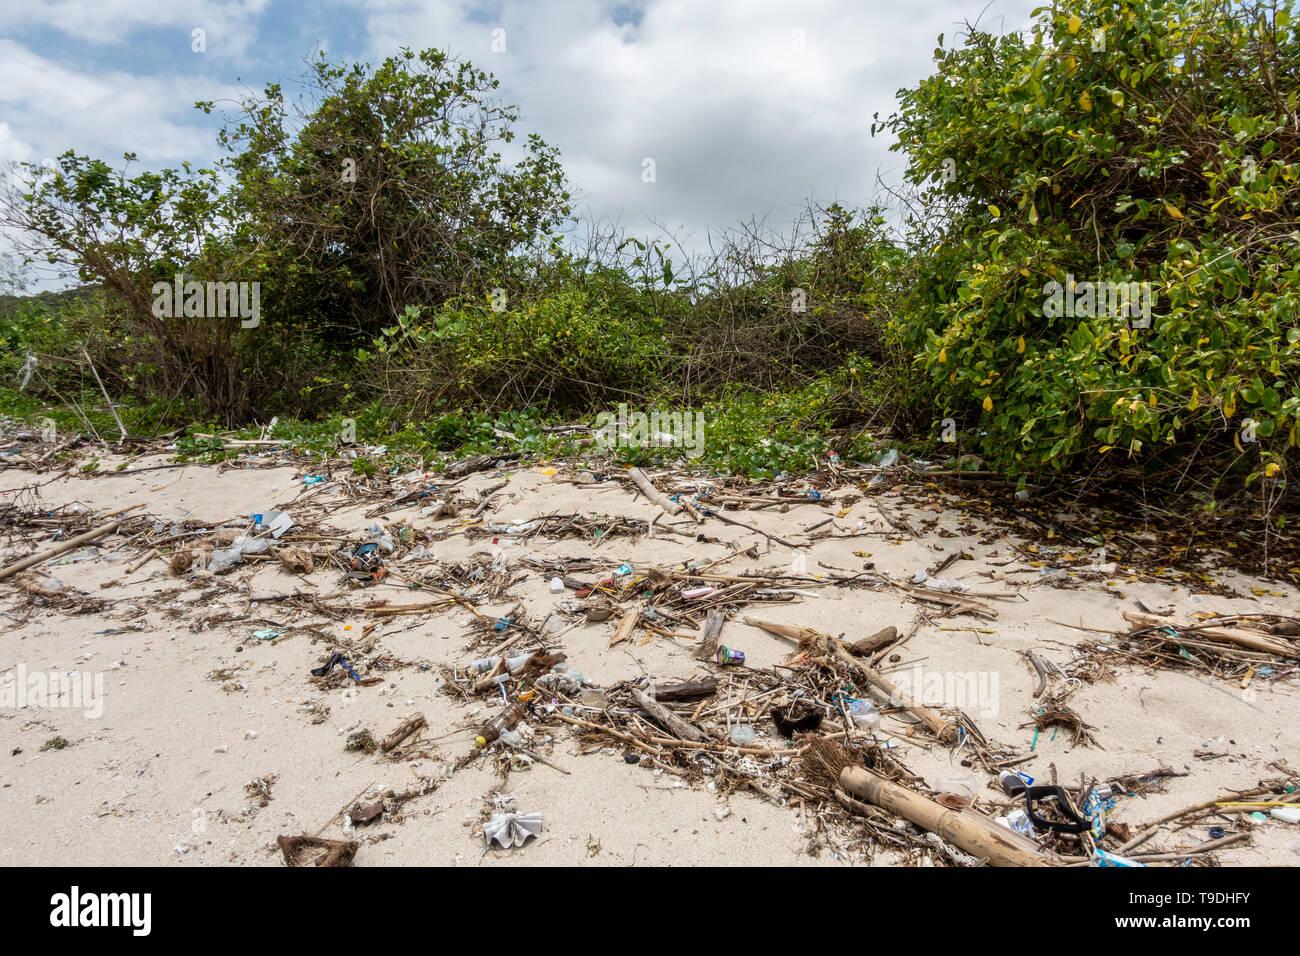 Lomok, Indonesia - February  2 2019 Plastic waste on a deserted beach in Lombok near Kuta, Indonesia - Stock Image